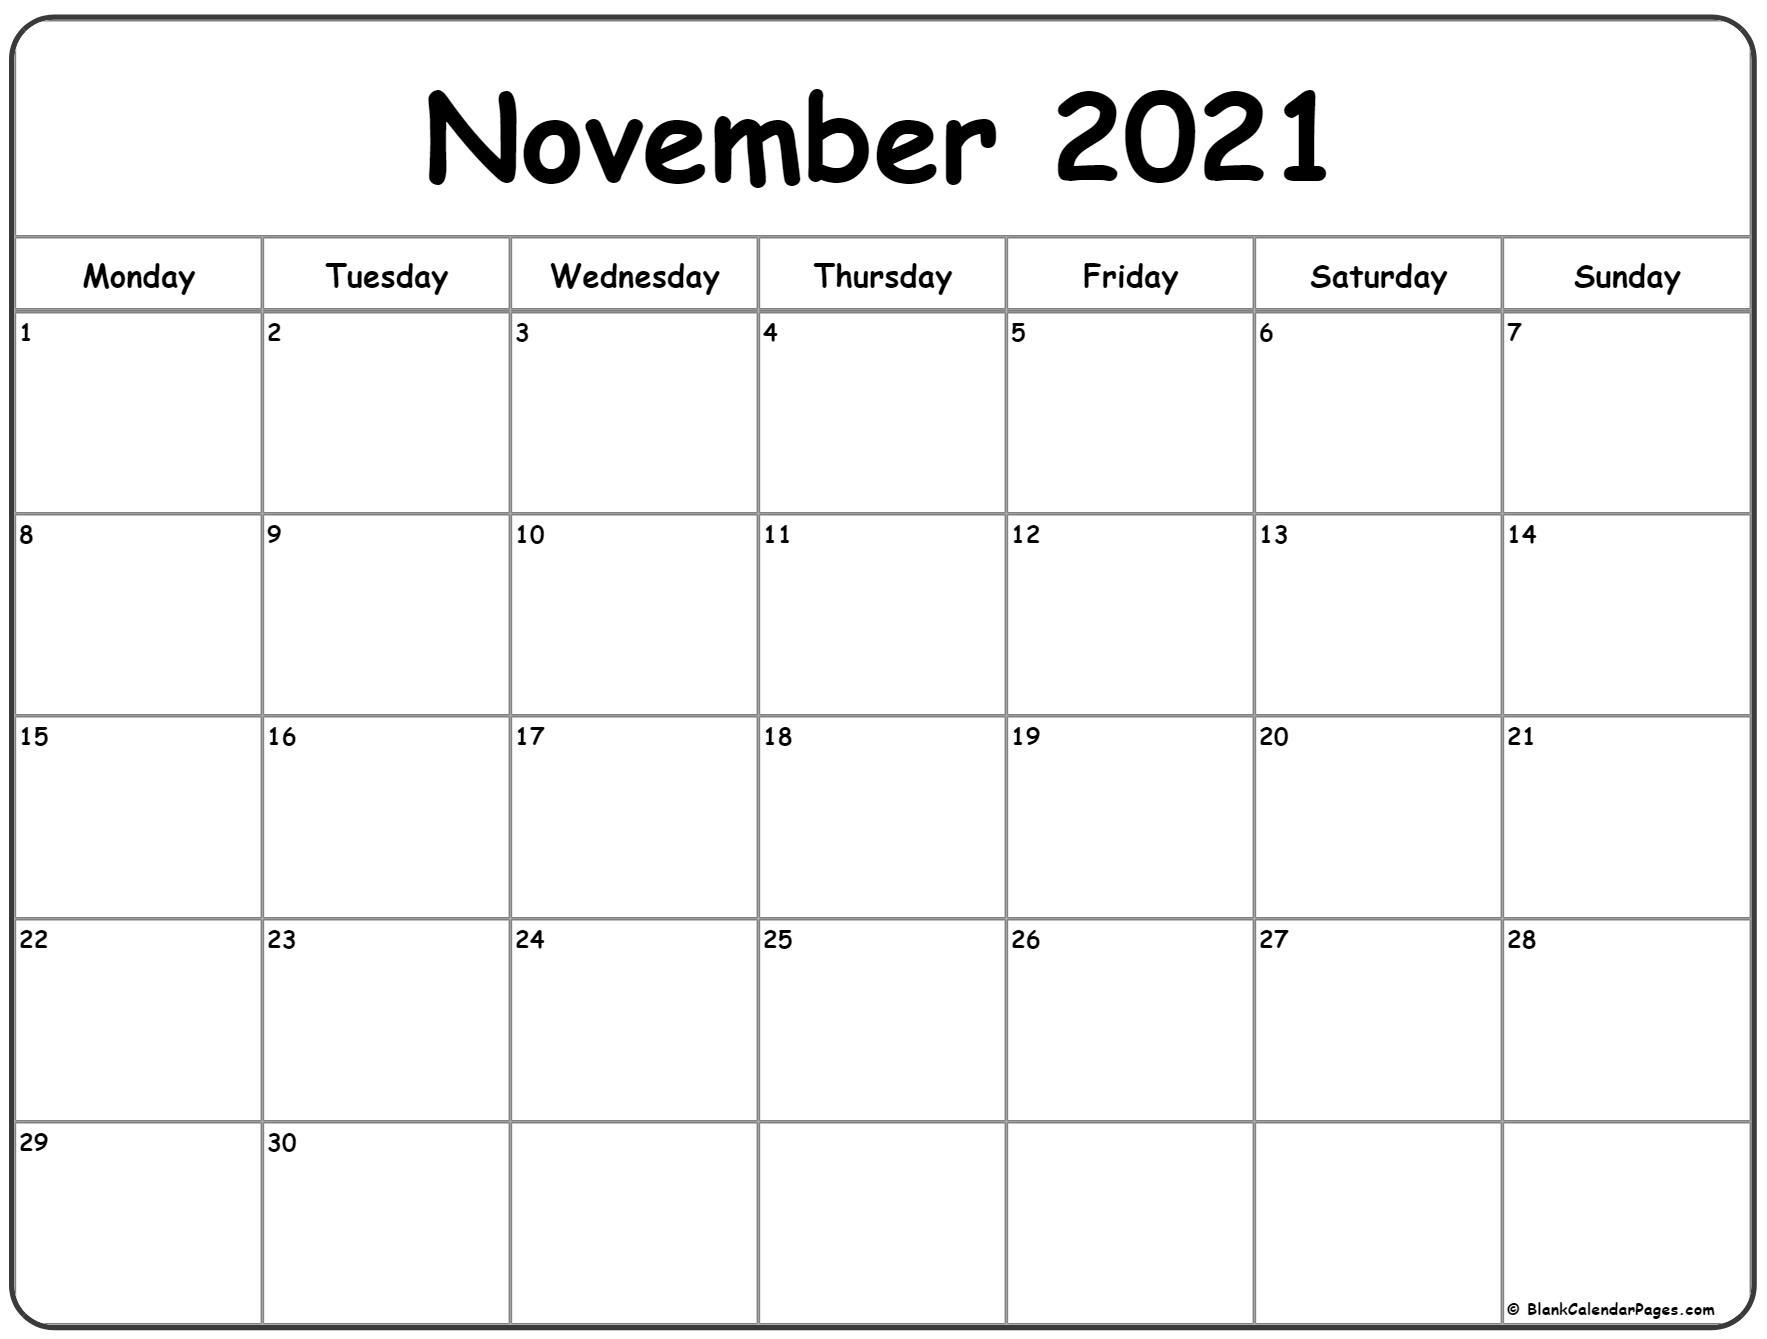 November 2021 Monday Calendar | Monday To Sunday